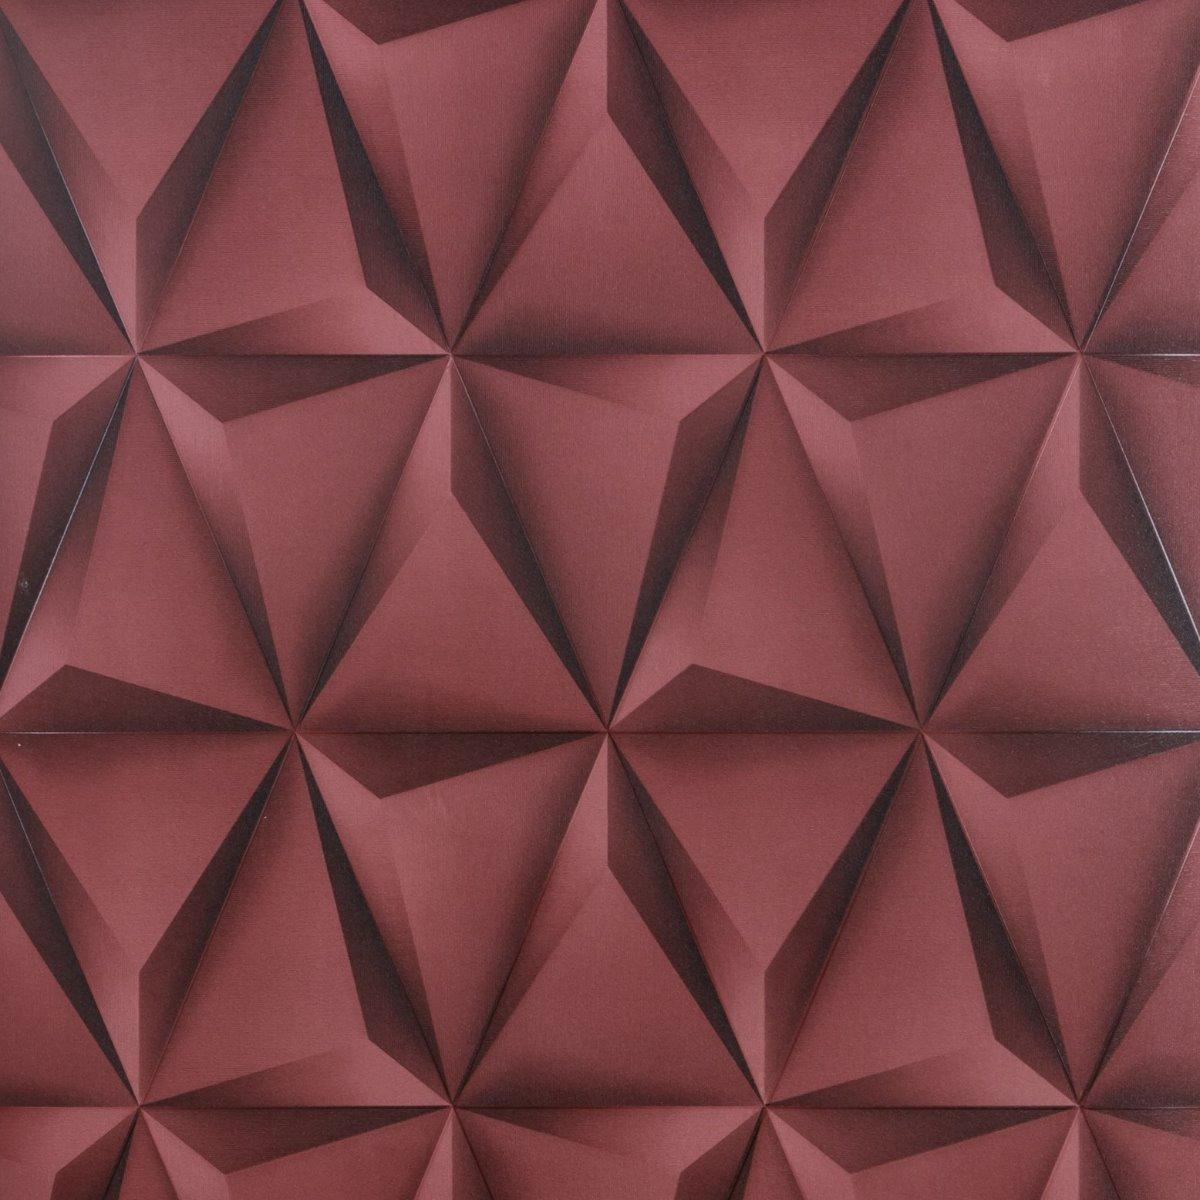 Papel de parede geom trico 3d banheiro lavabo suite - Papel autoadhesivo para paredes ...